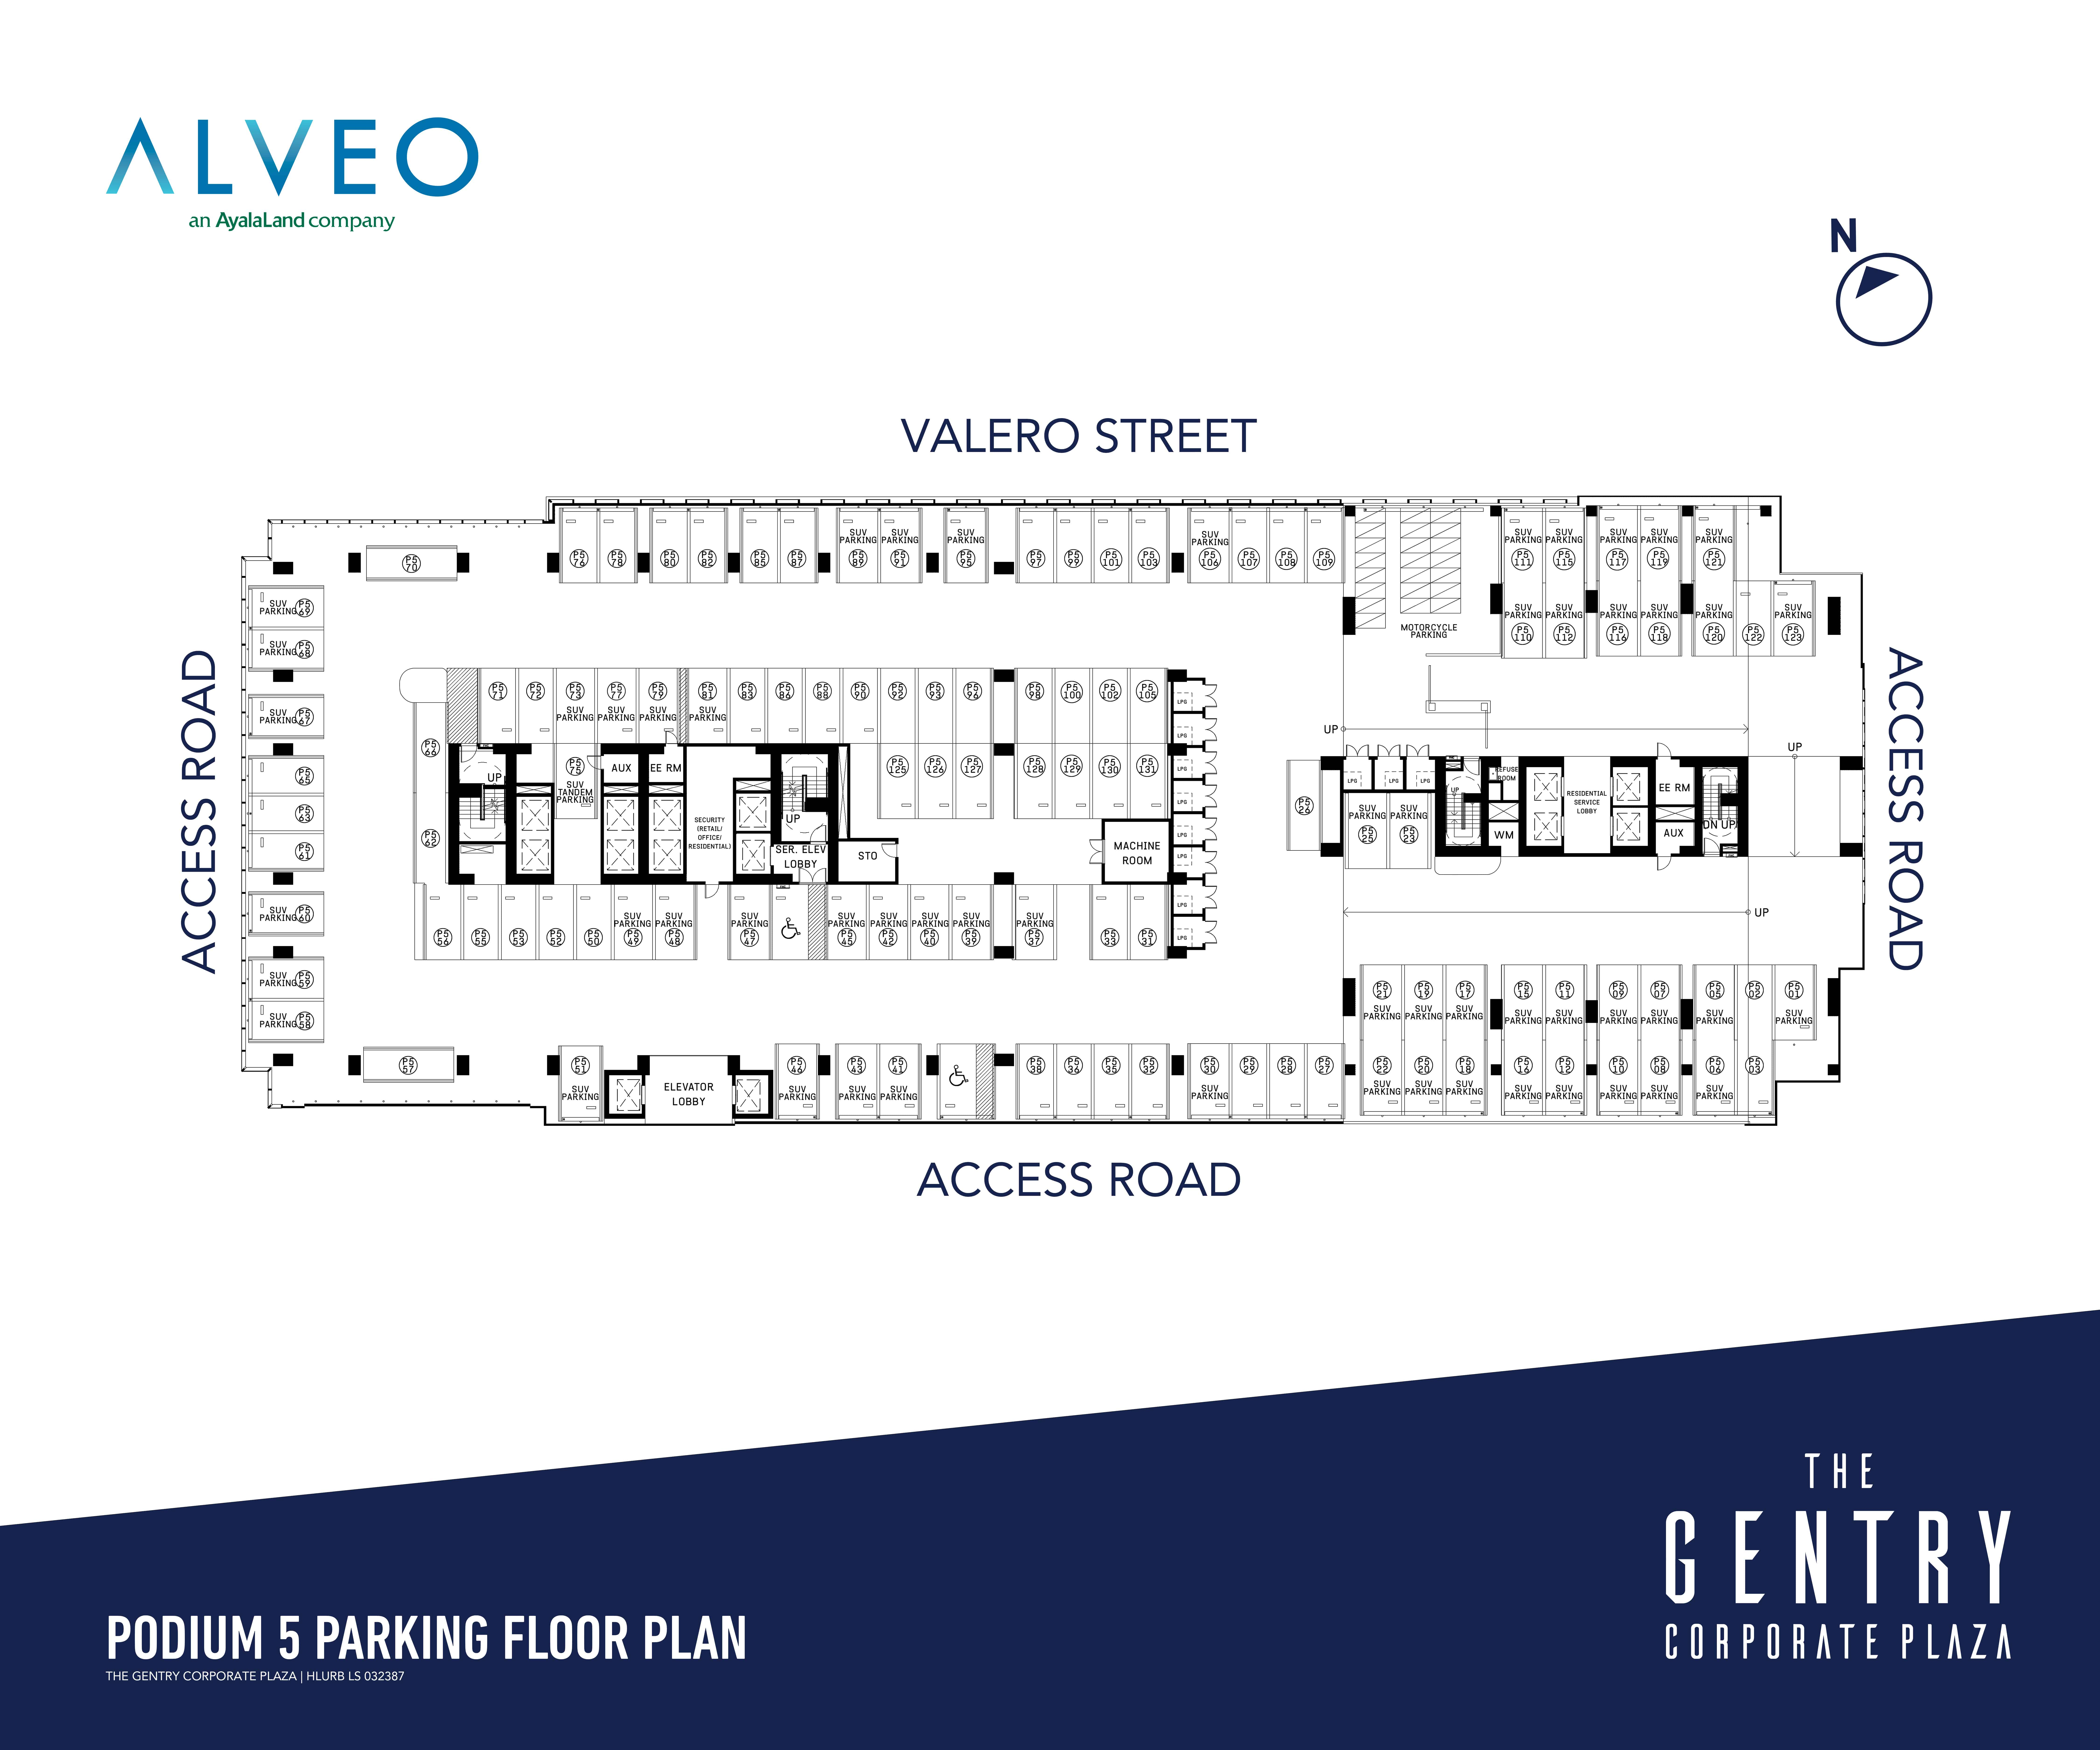 the-gentry-corporate-plaza---podium-5-floor-plan_35337891405_o